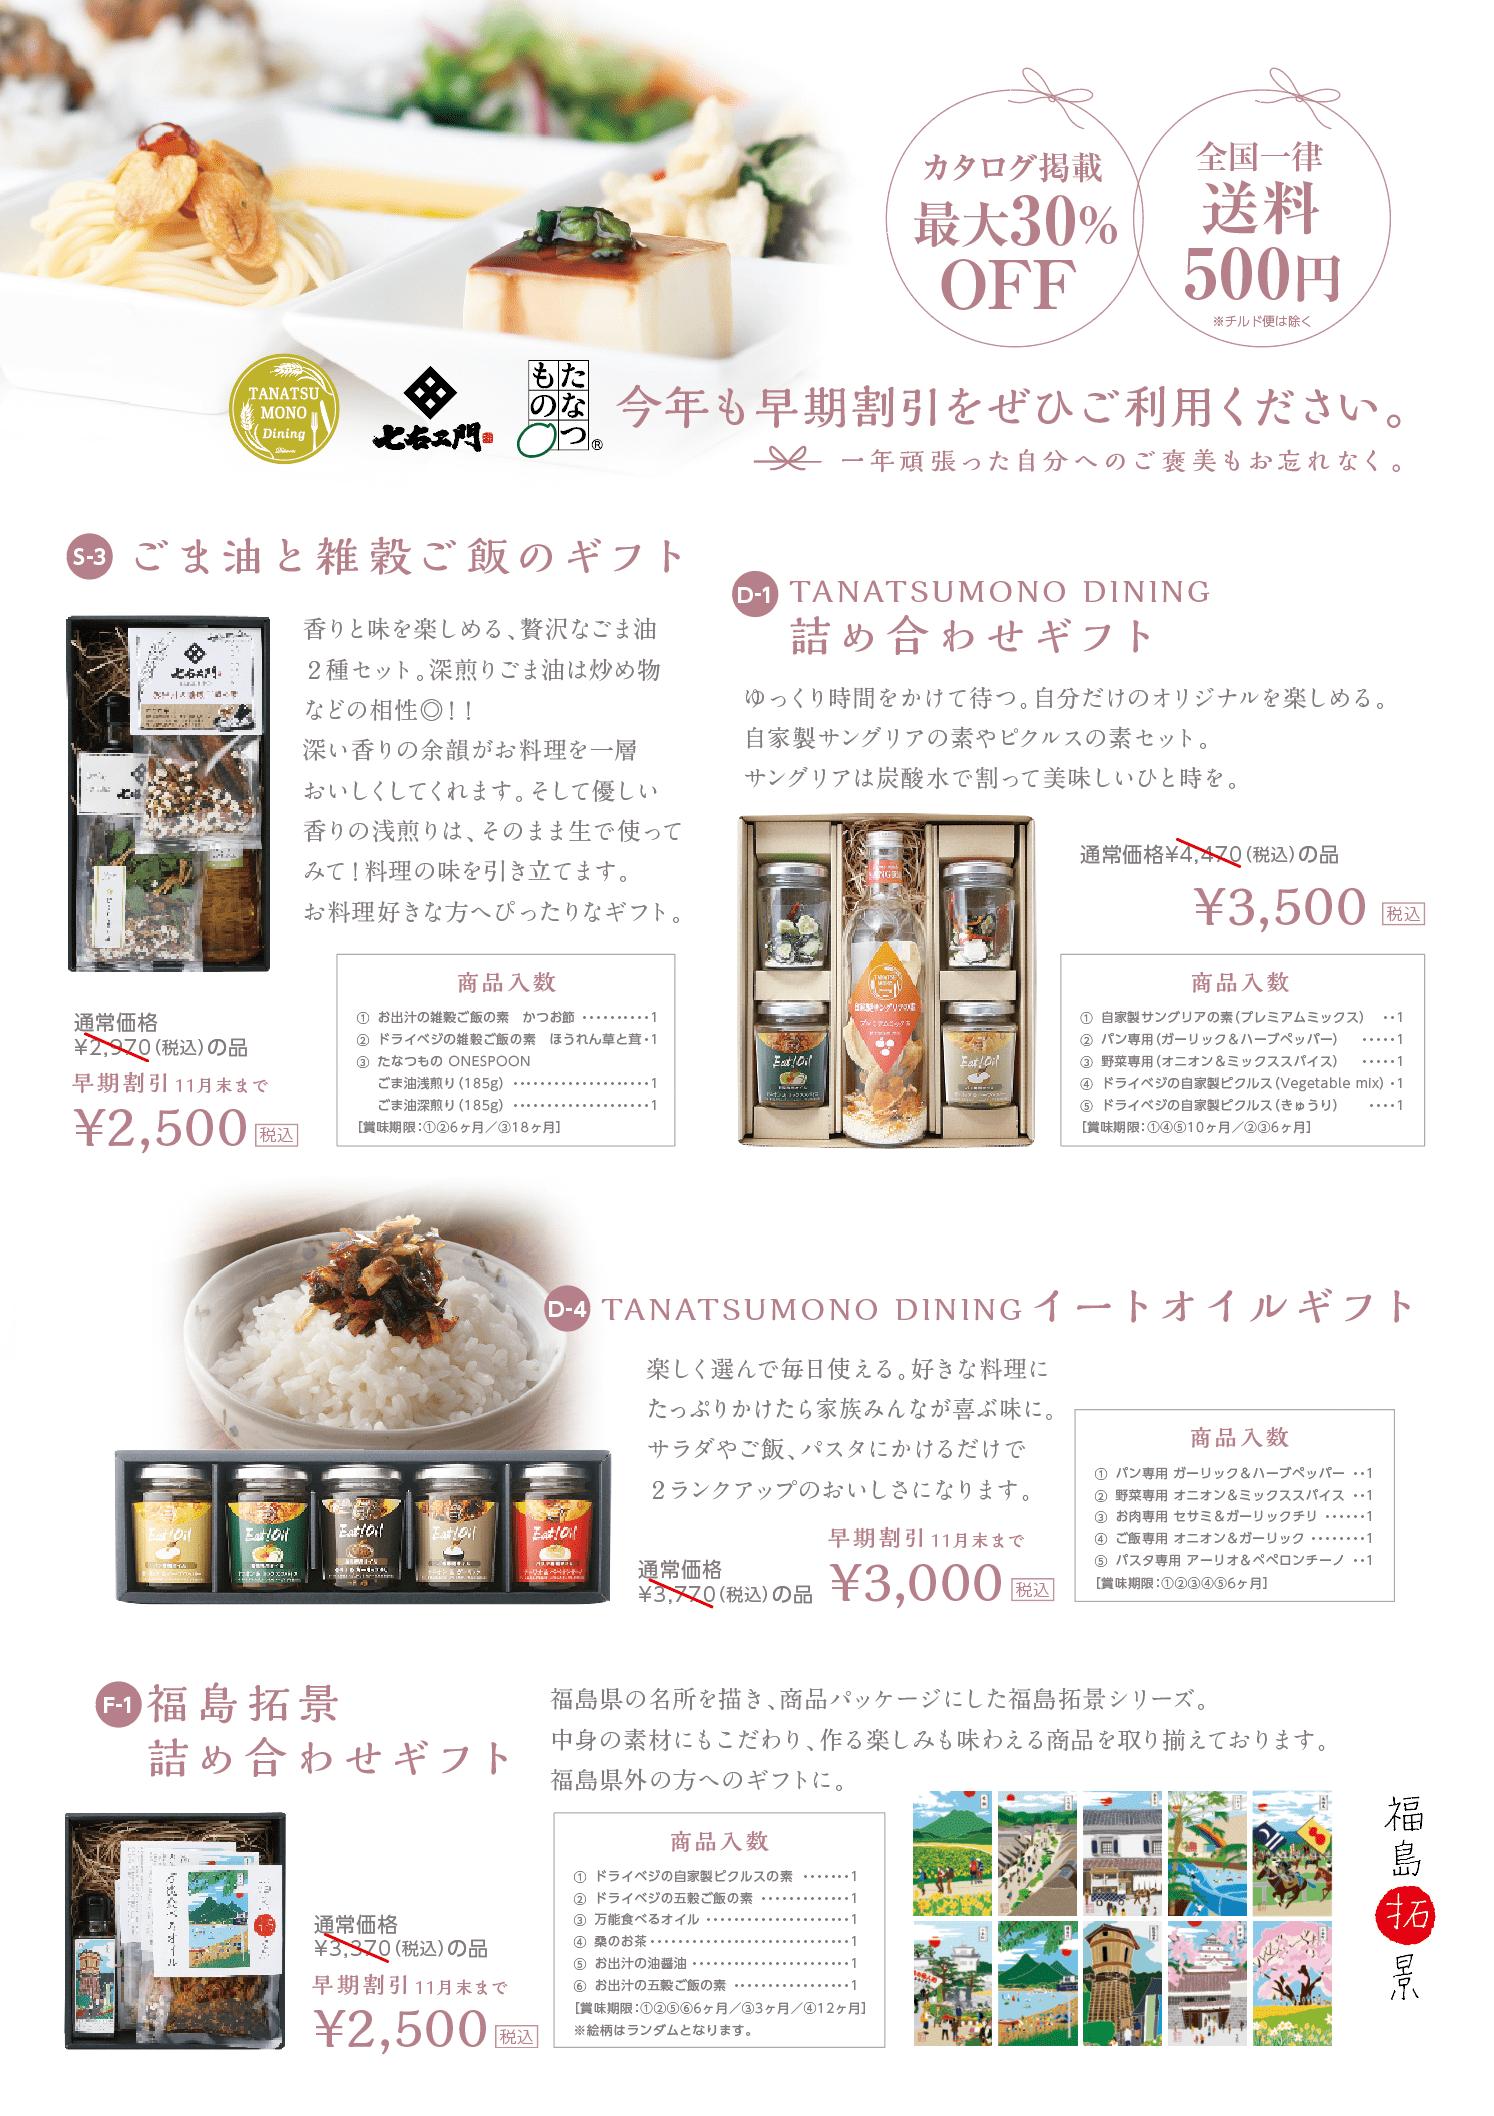 tanatsumonoyaoseibo2017-3